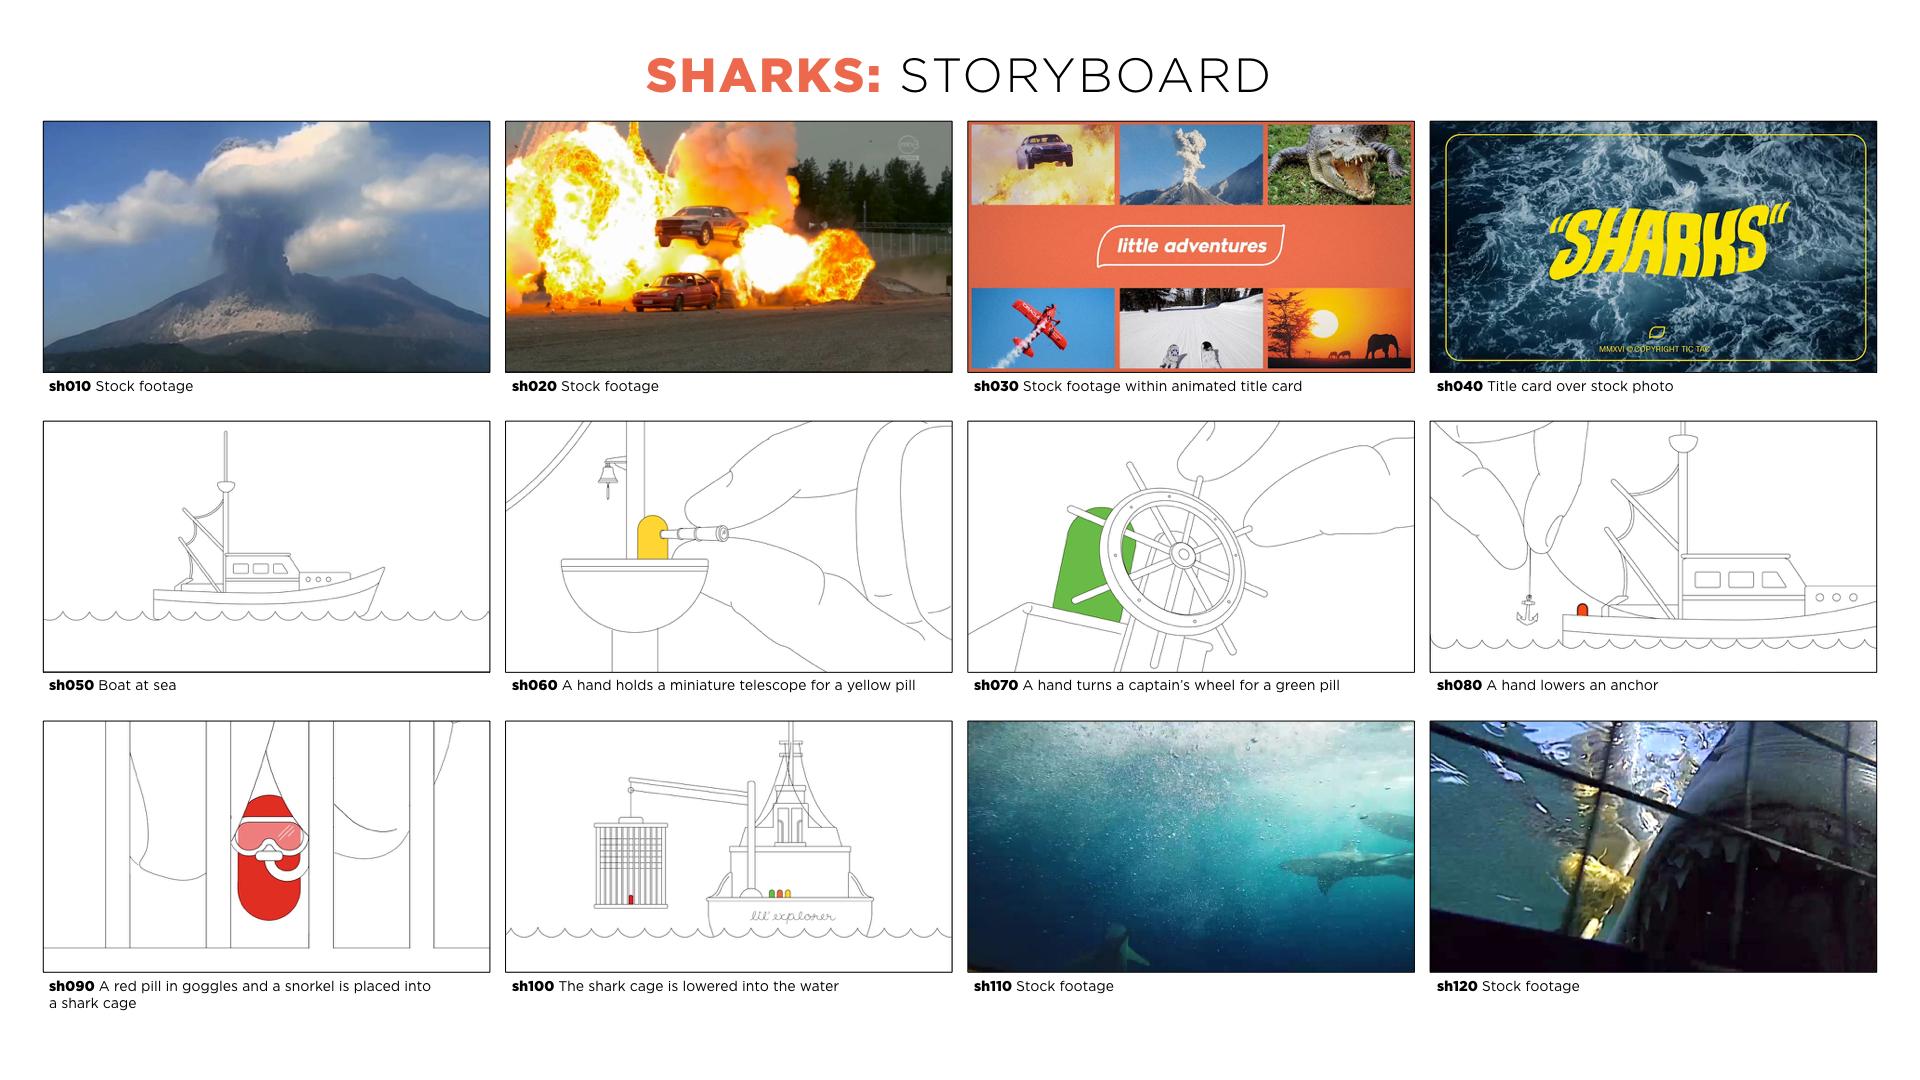 TicTac_LittleAdventures-Storyboardos_01.007.jpeg